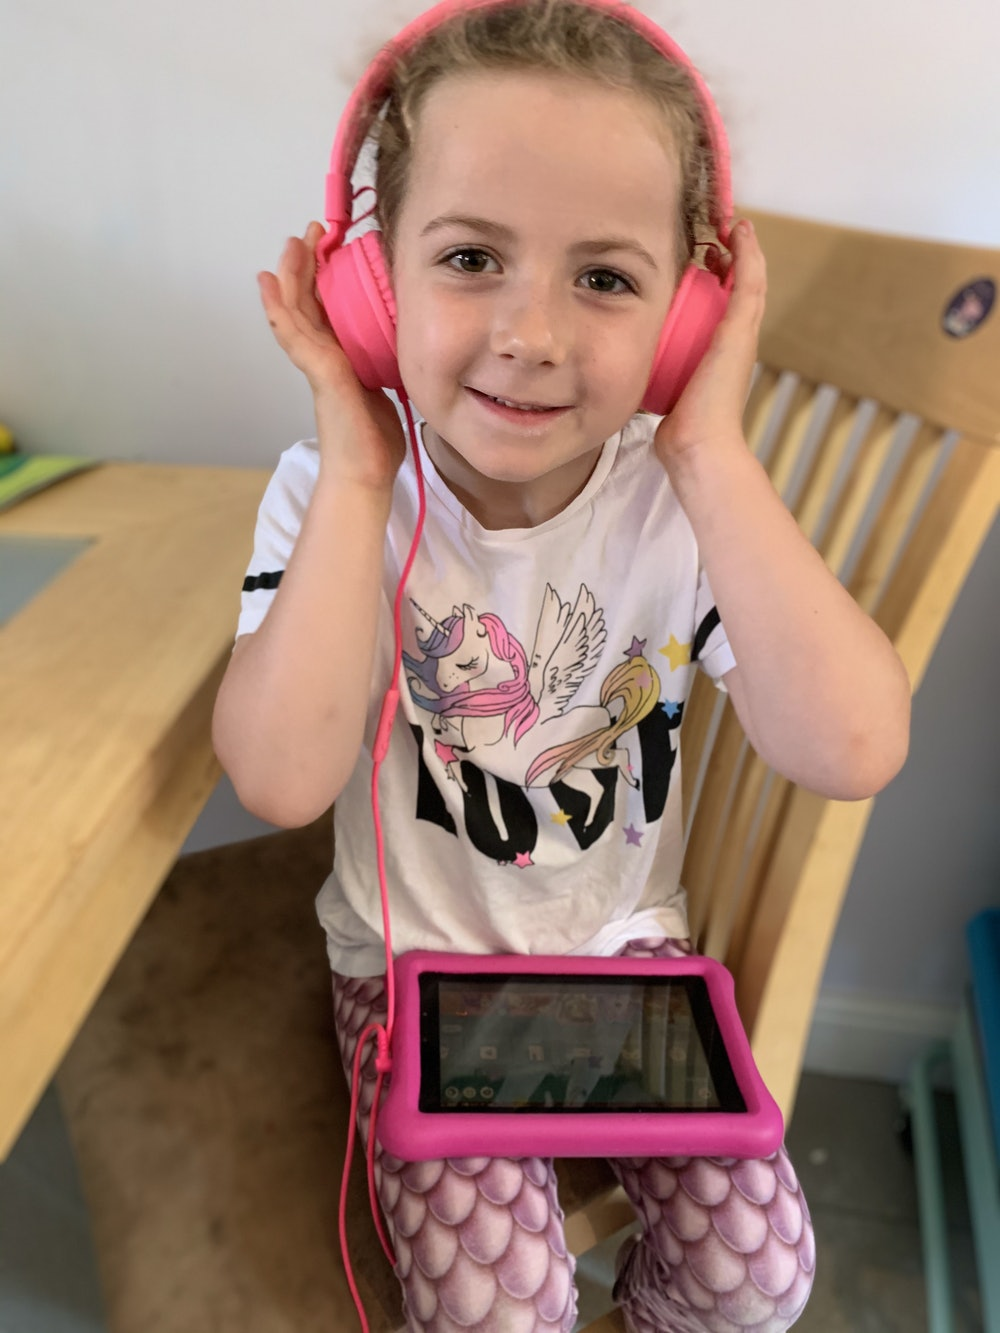 PuroBasic kids headphones